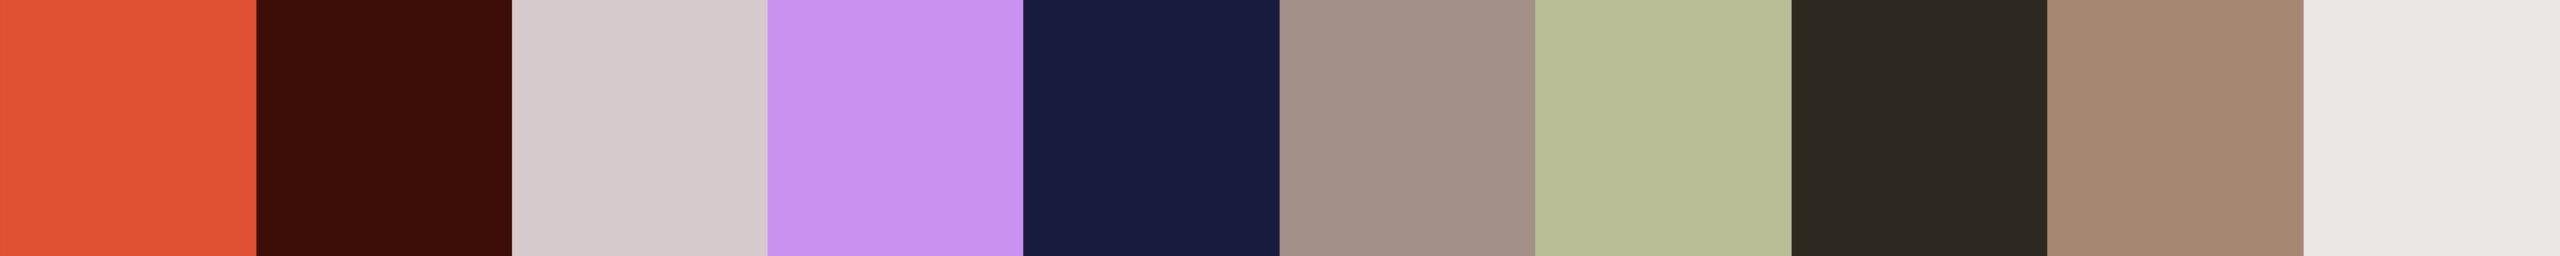 659 Sovezza Color Palette